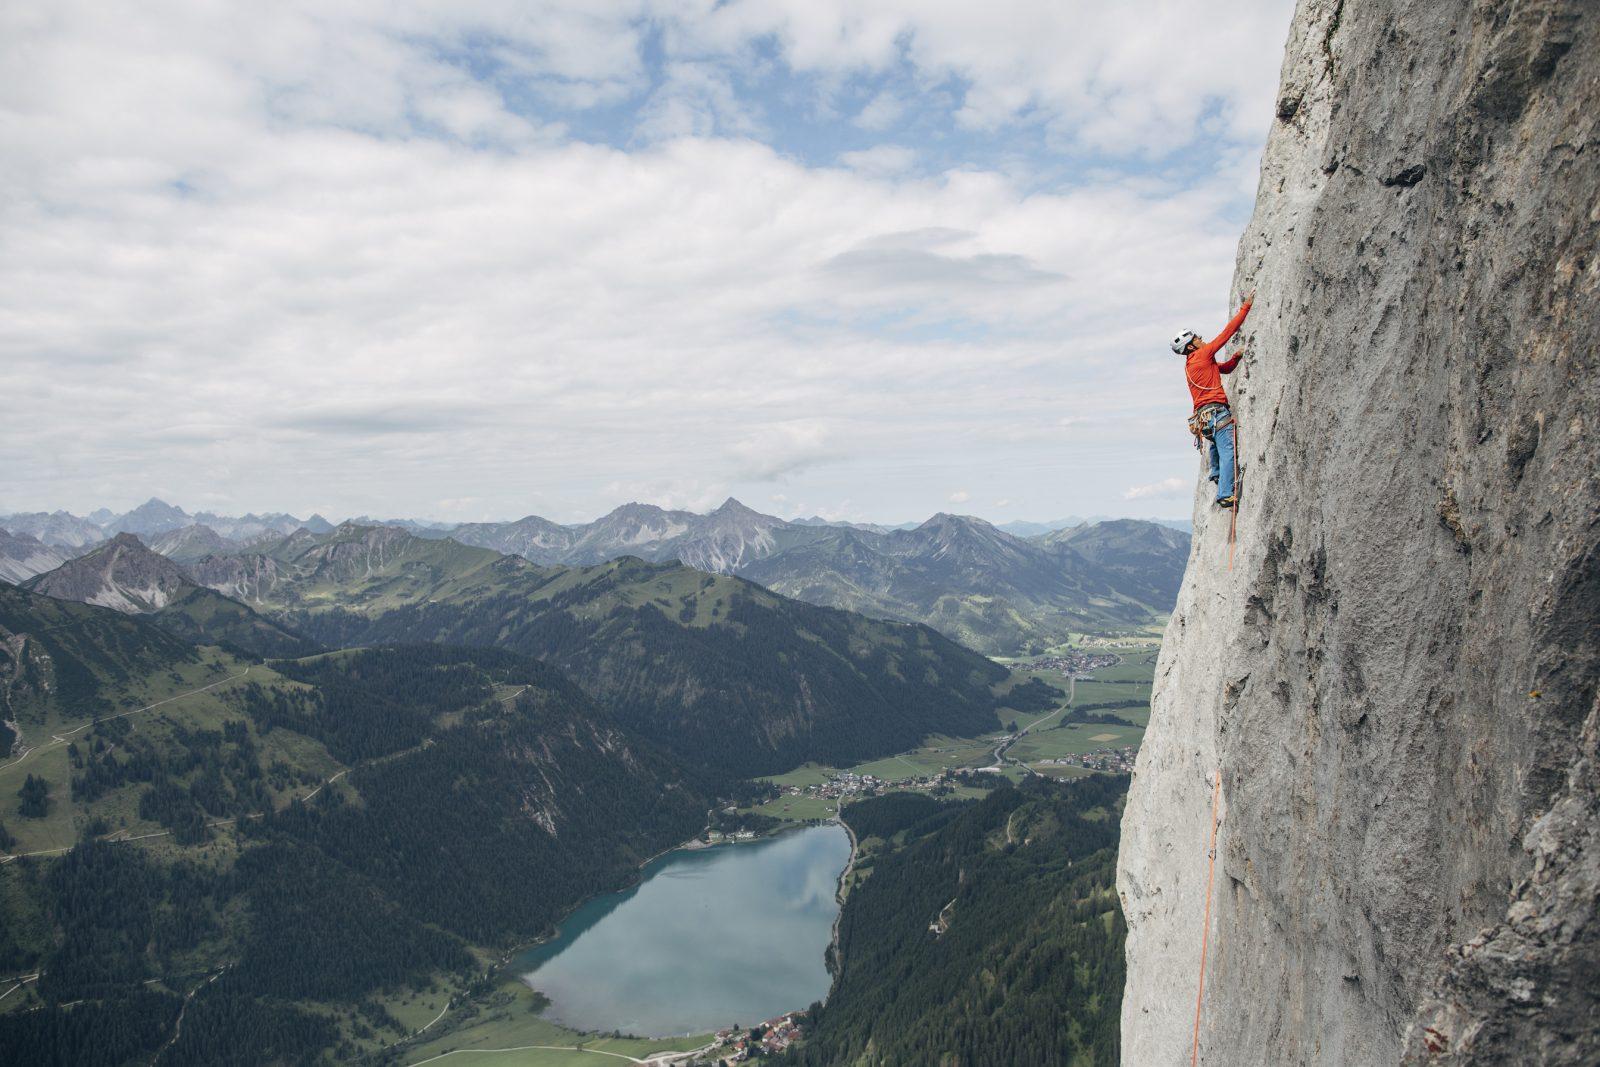 Klettern an der Roten Flüh im Tannheimer Tal, Foto: Elias Holzknecht | Climbers Paradise